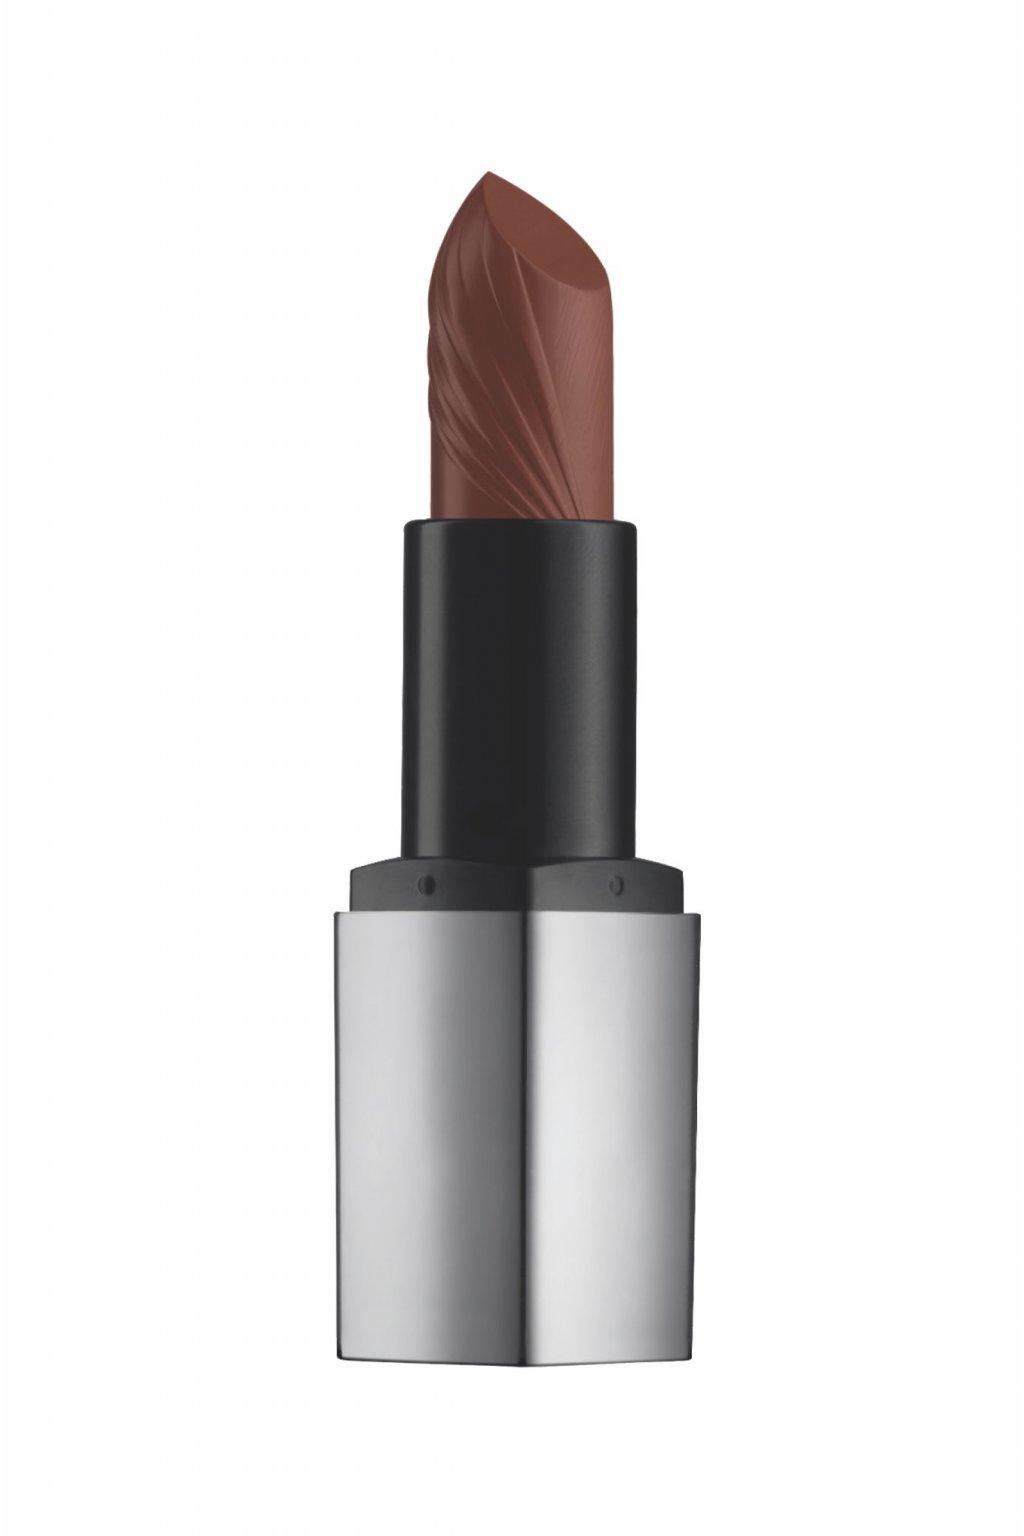 35215 Mineral Boost Lipstick 5W Flirting Chocolate